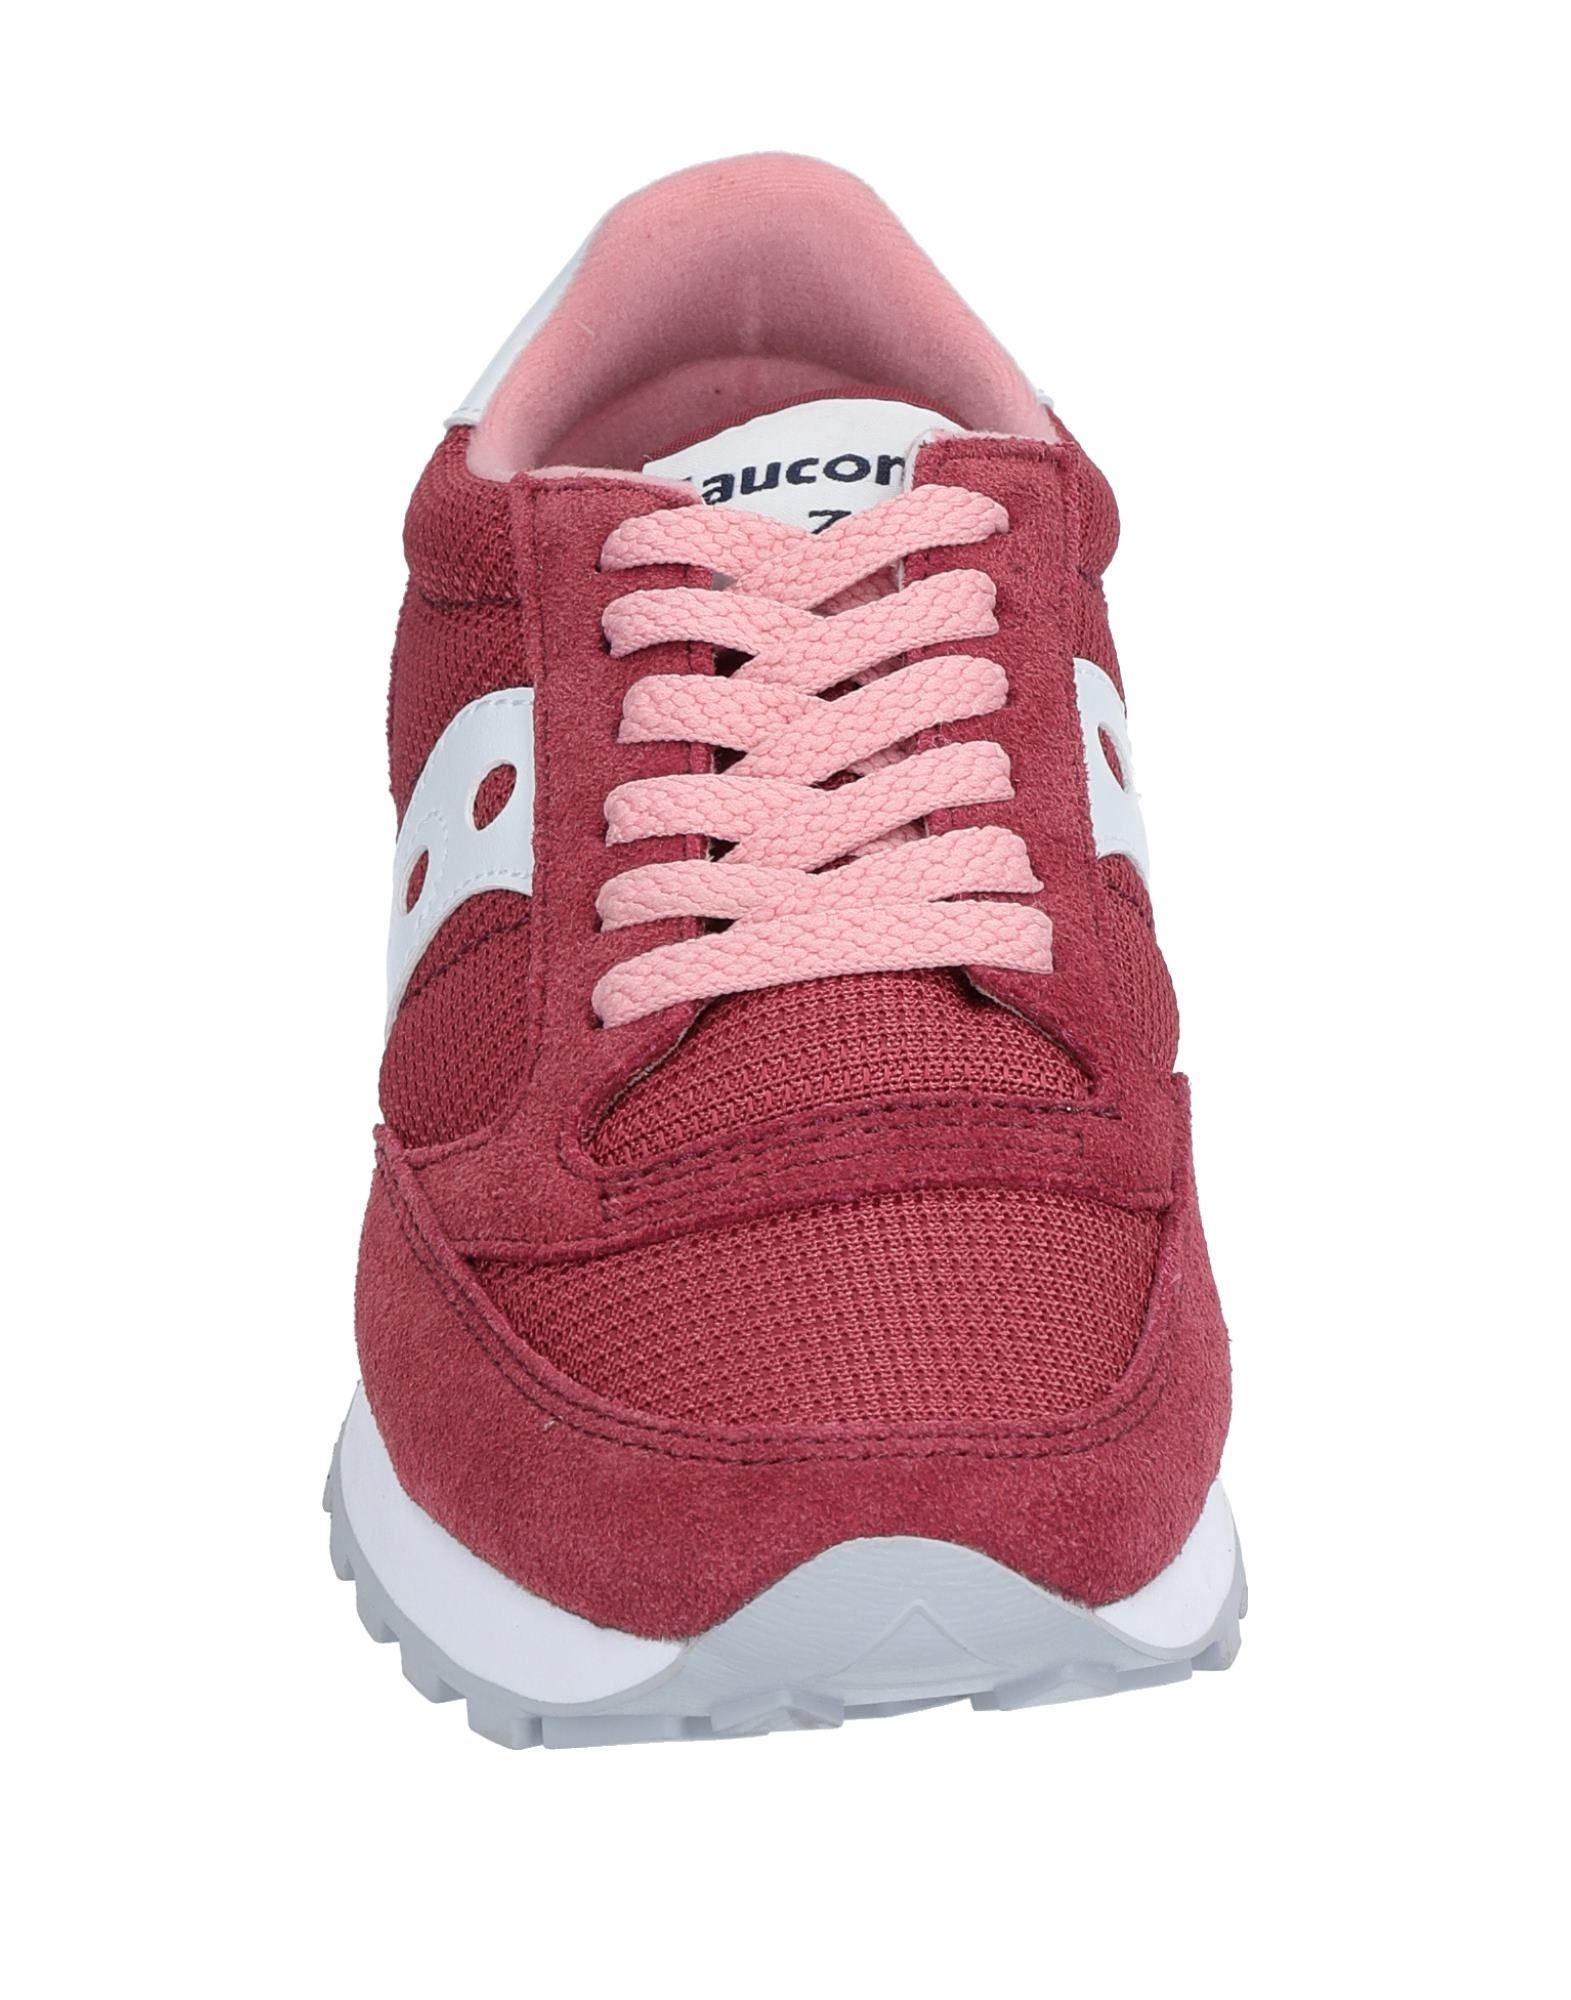 Saucony Sneakers Damen  11526573AC Gute Qualität beliebte Schuhe